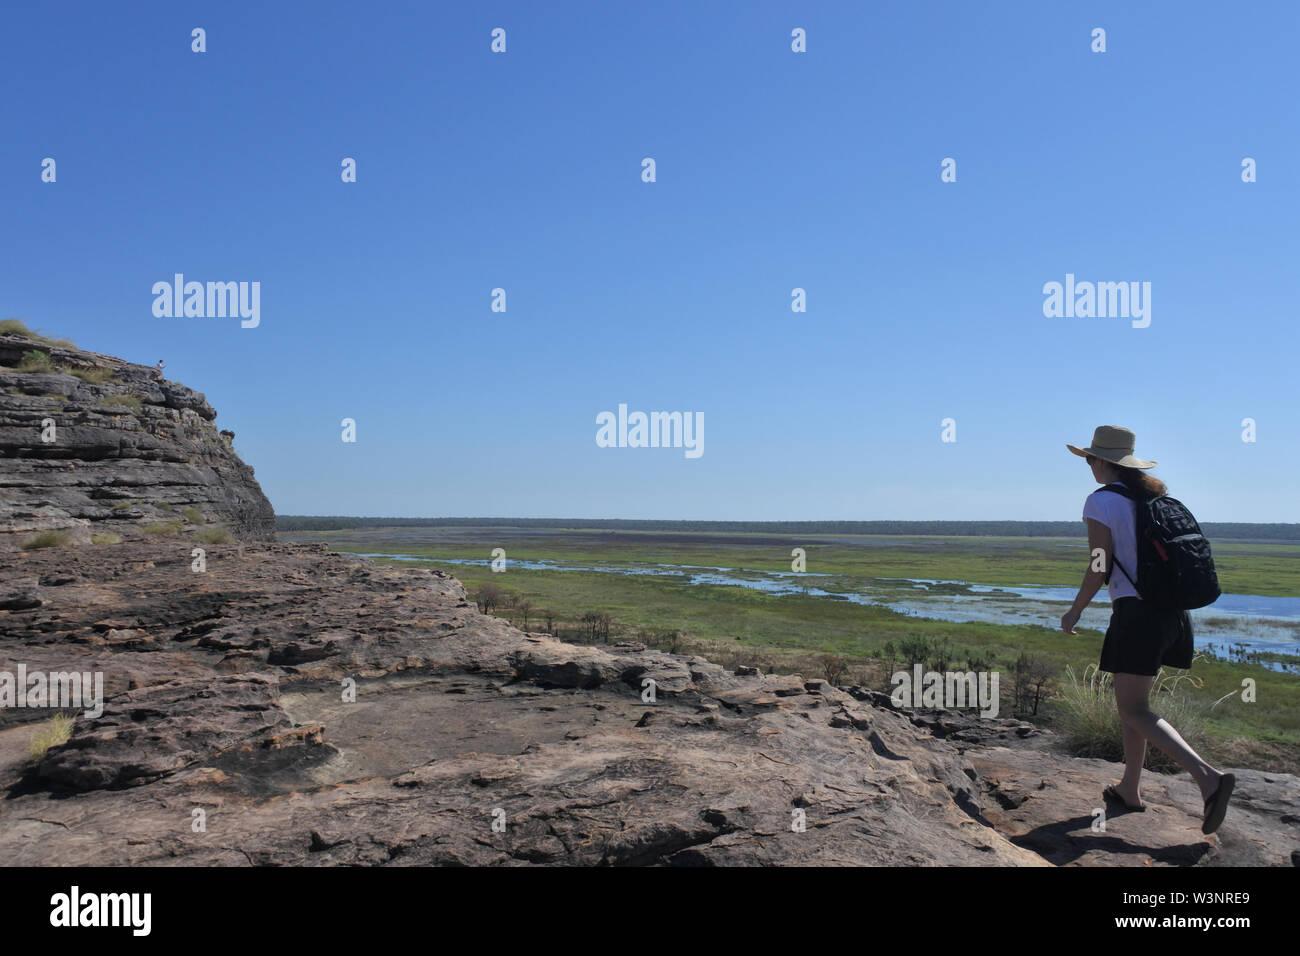 Australian adult woman tourist hiking at Ubirr rock art site in Kakadu National Park Northern Territory of Australia. - Stock Image